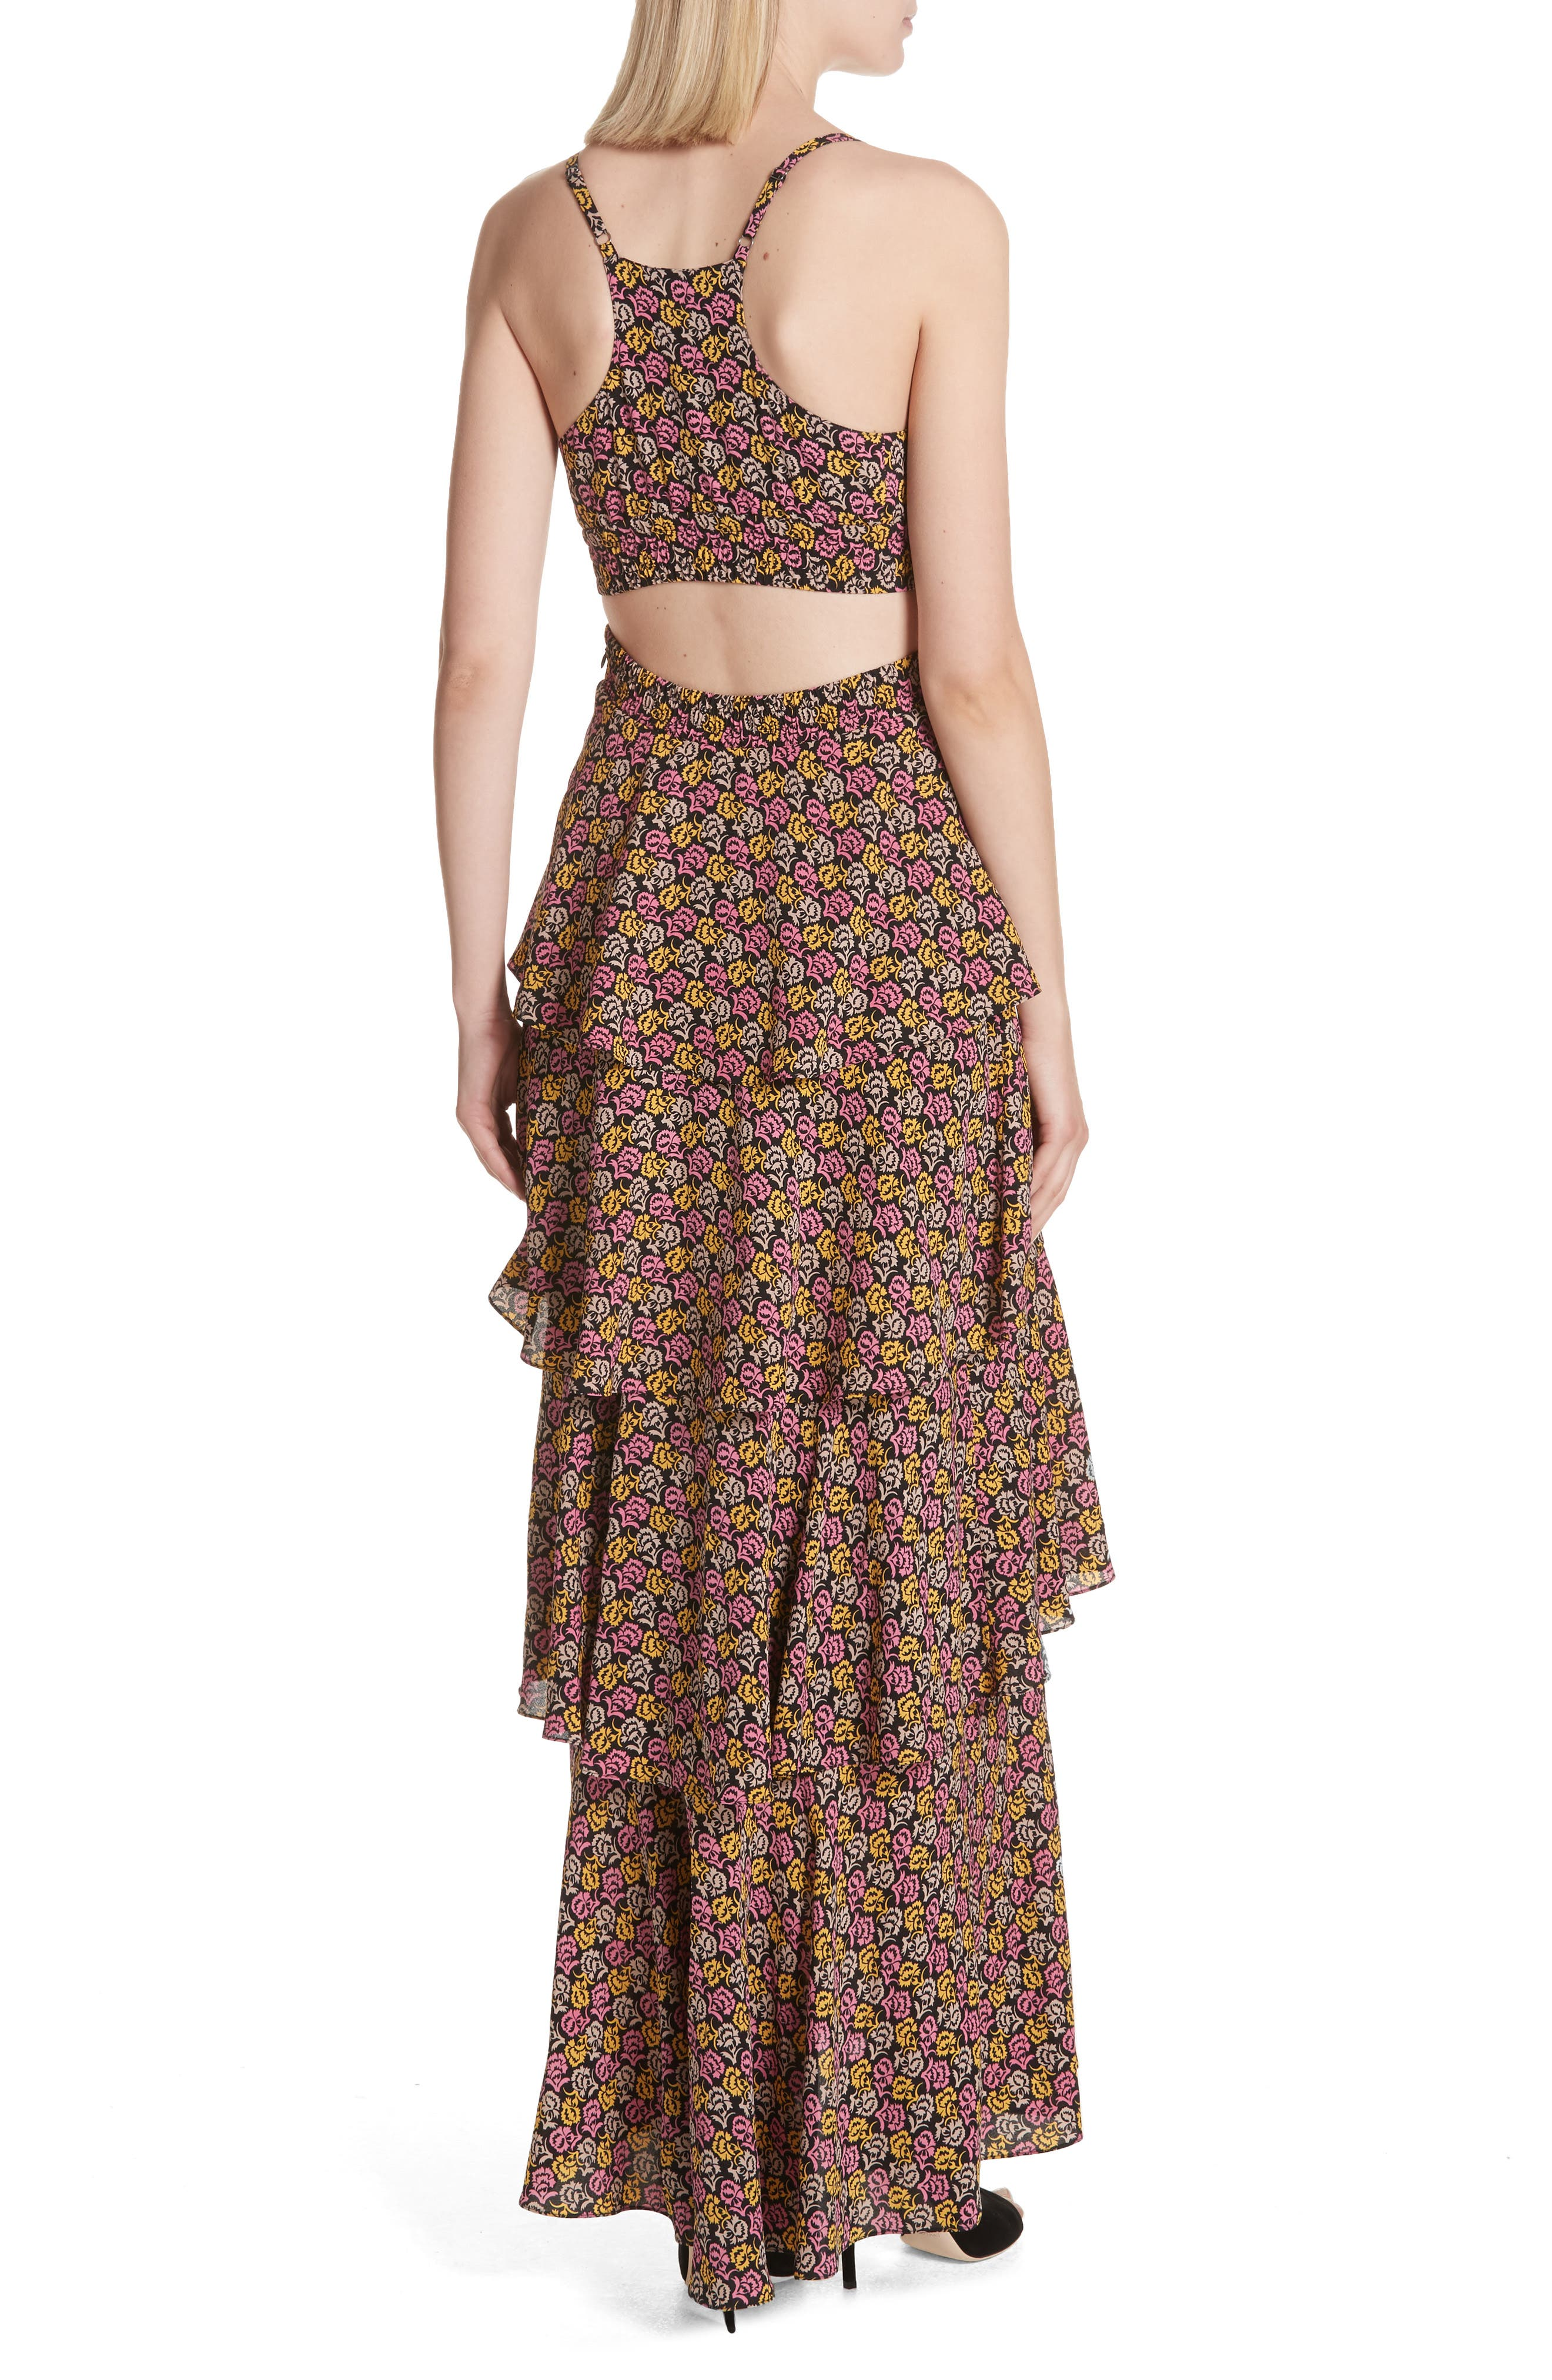 Titus Print Silk Tiered Maxi Dress,                             Alternate thumbnail 2, color,                             651